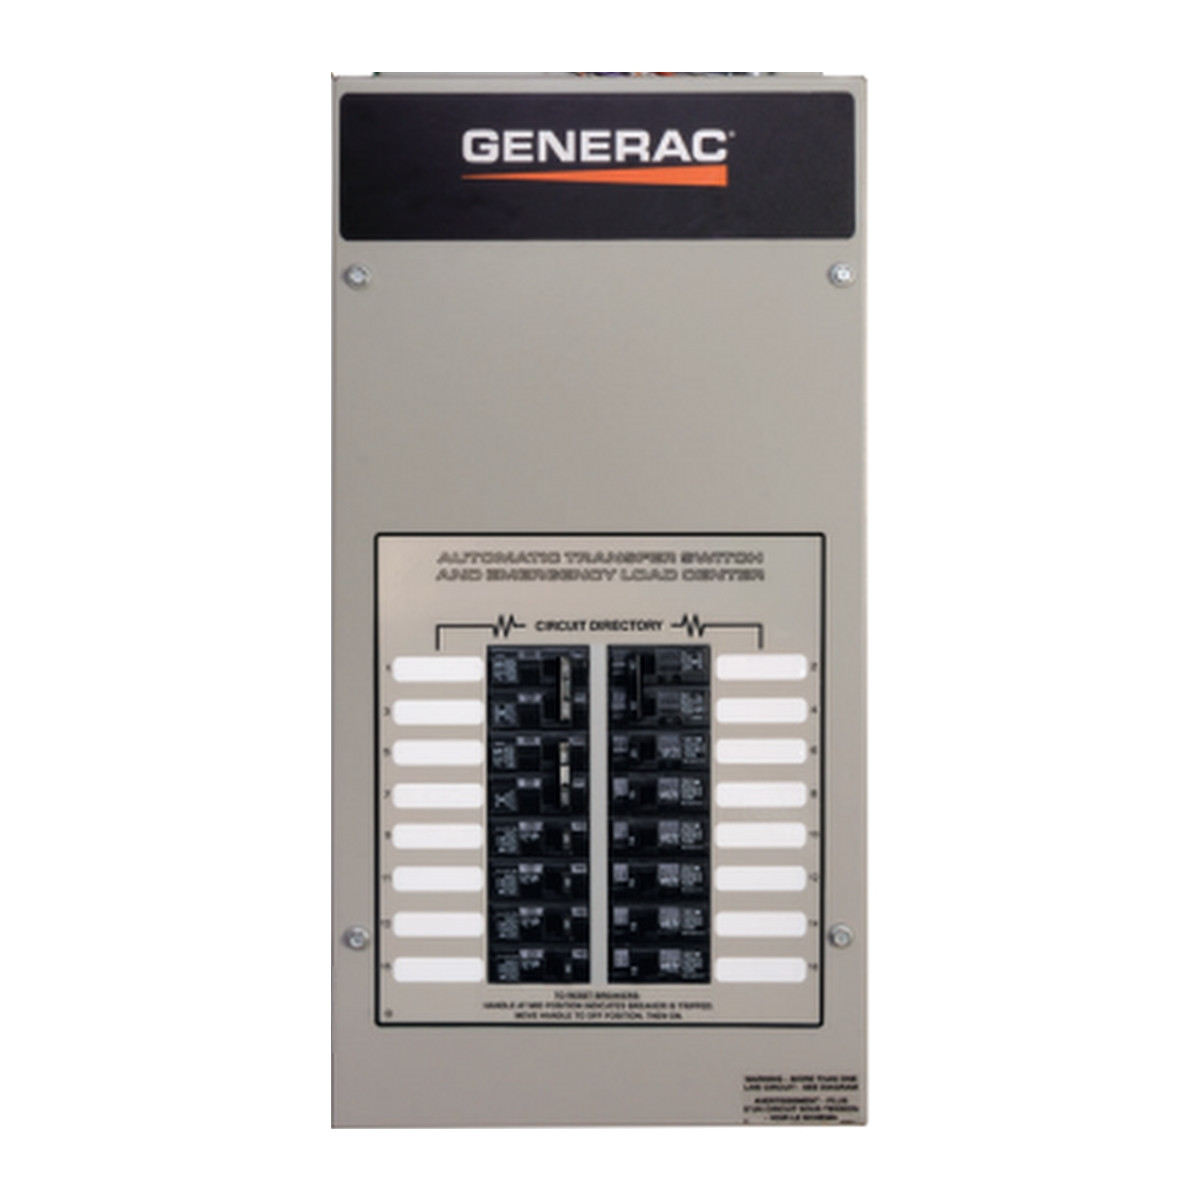 Rxg10eza1 Generac 50a 10 Circuit Transfer Switch W Load Center Kit 200 Automatic Wiring Diagram 1 120 240v Nema With